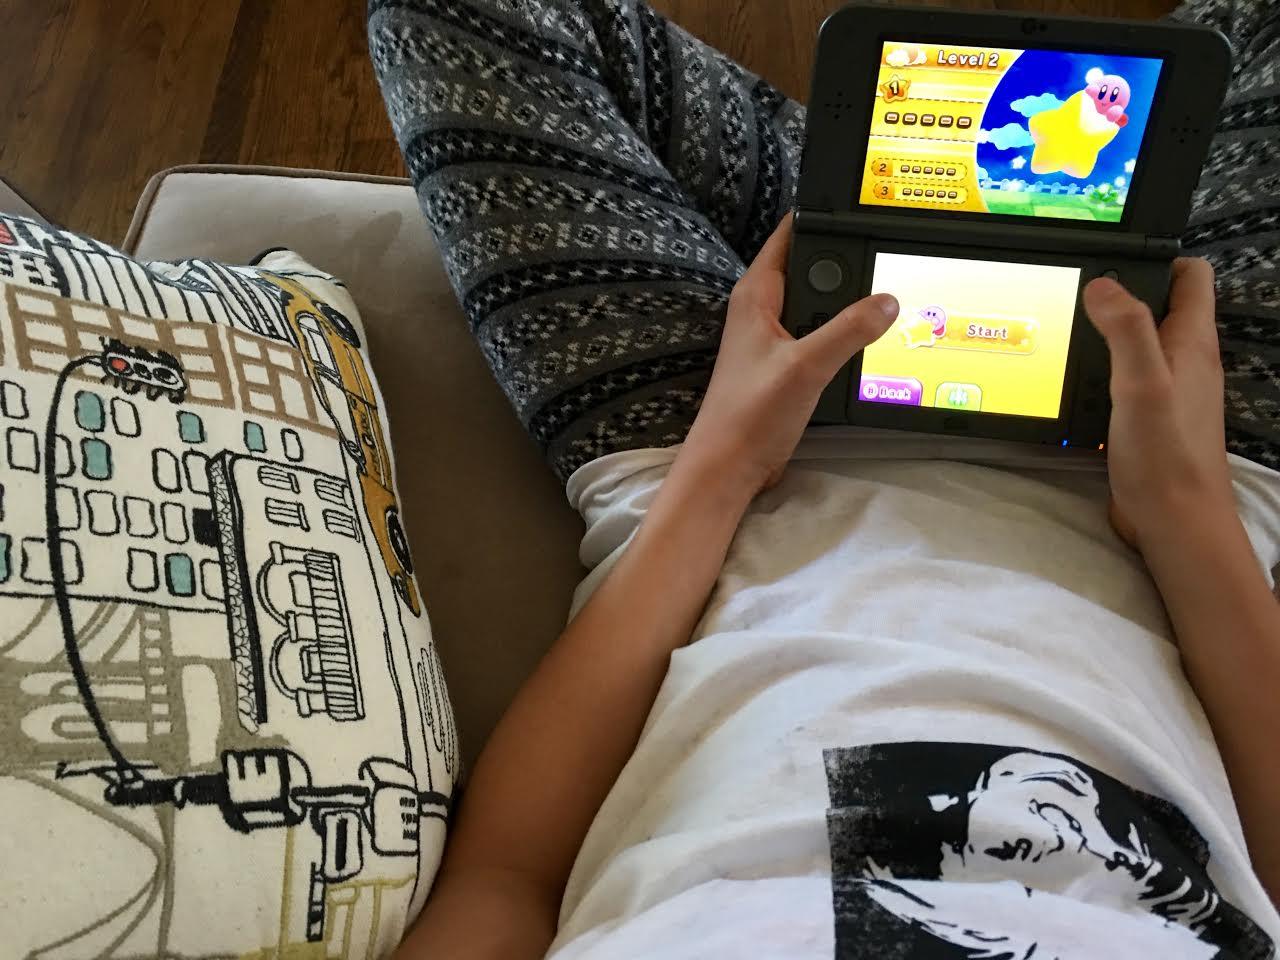 New Nintendo 3DS | The JetSet Family Kirby Robobot